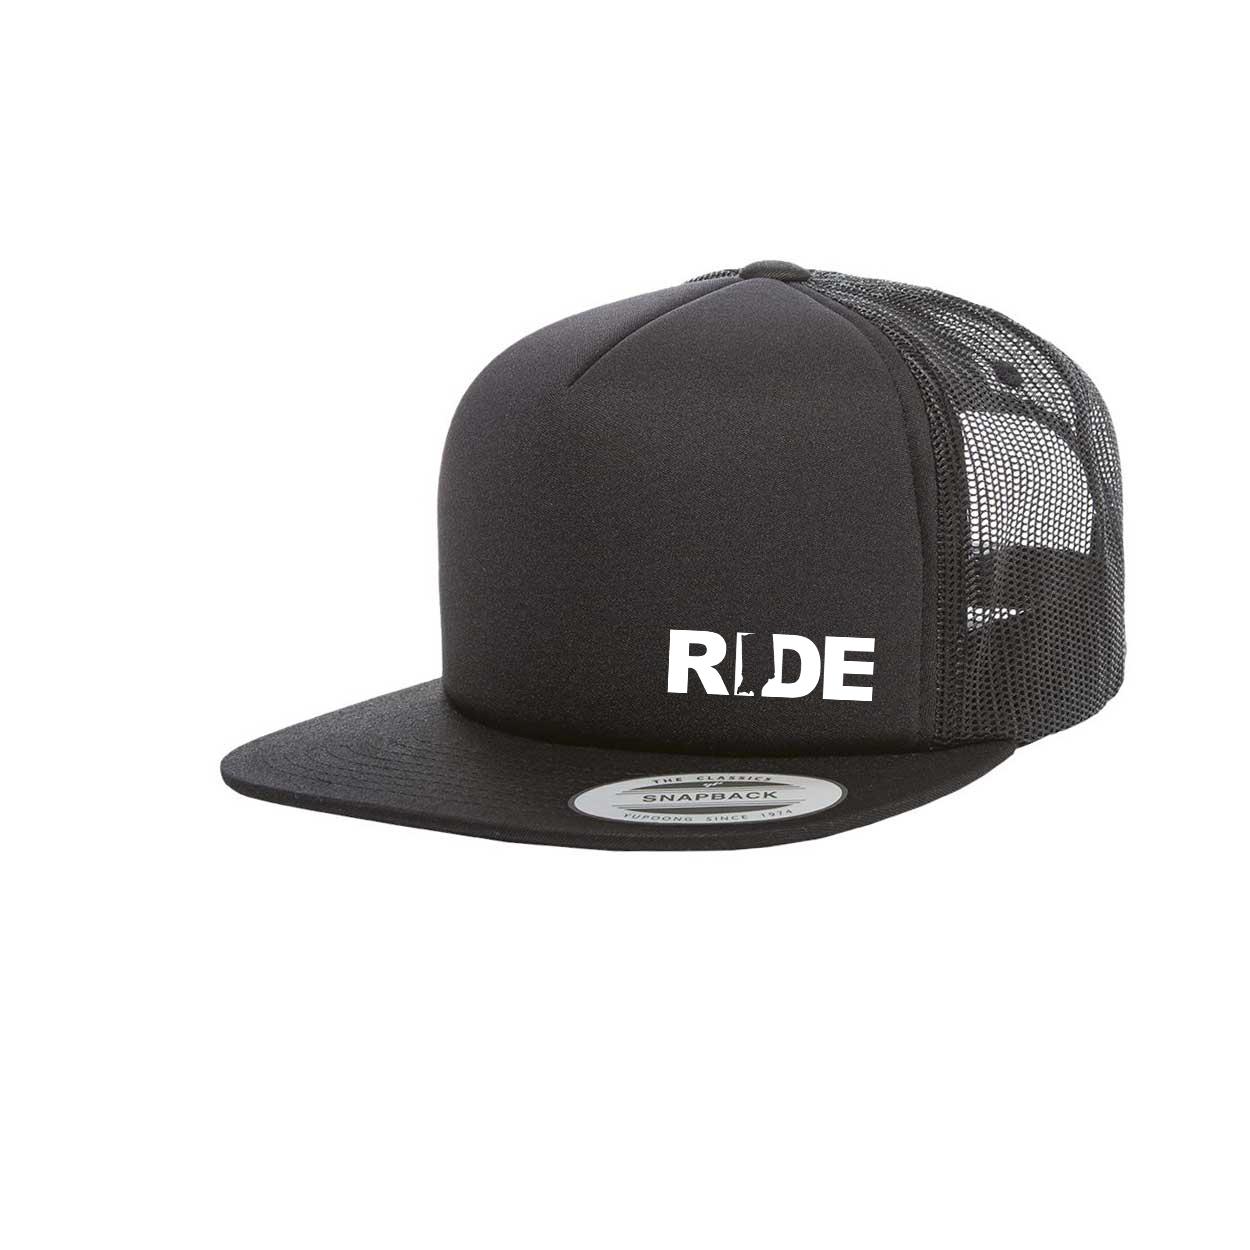 Ride Indiana Night Out Premium Foam Flat Brim Snapback Hat Black (White Logo)